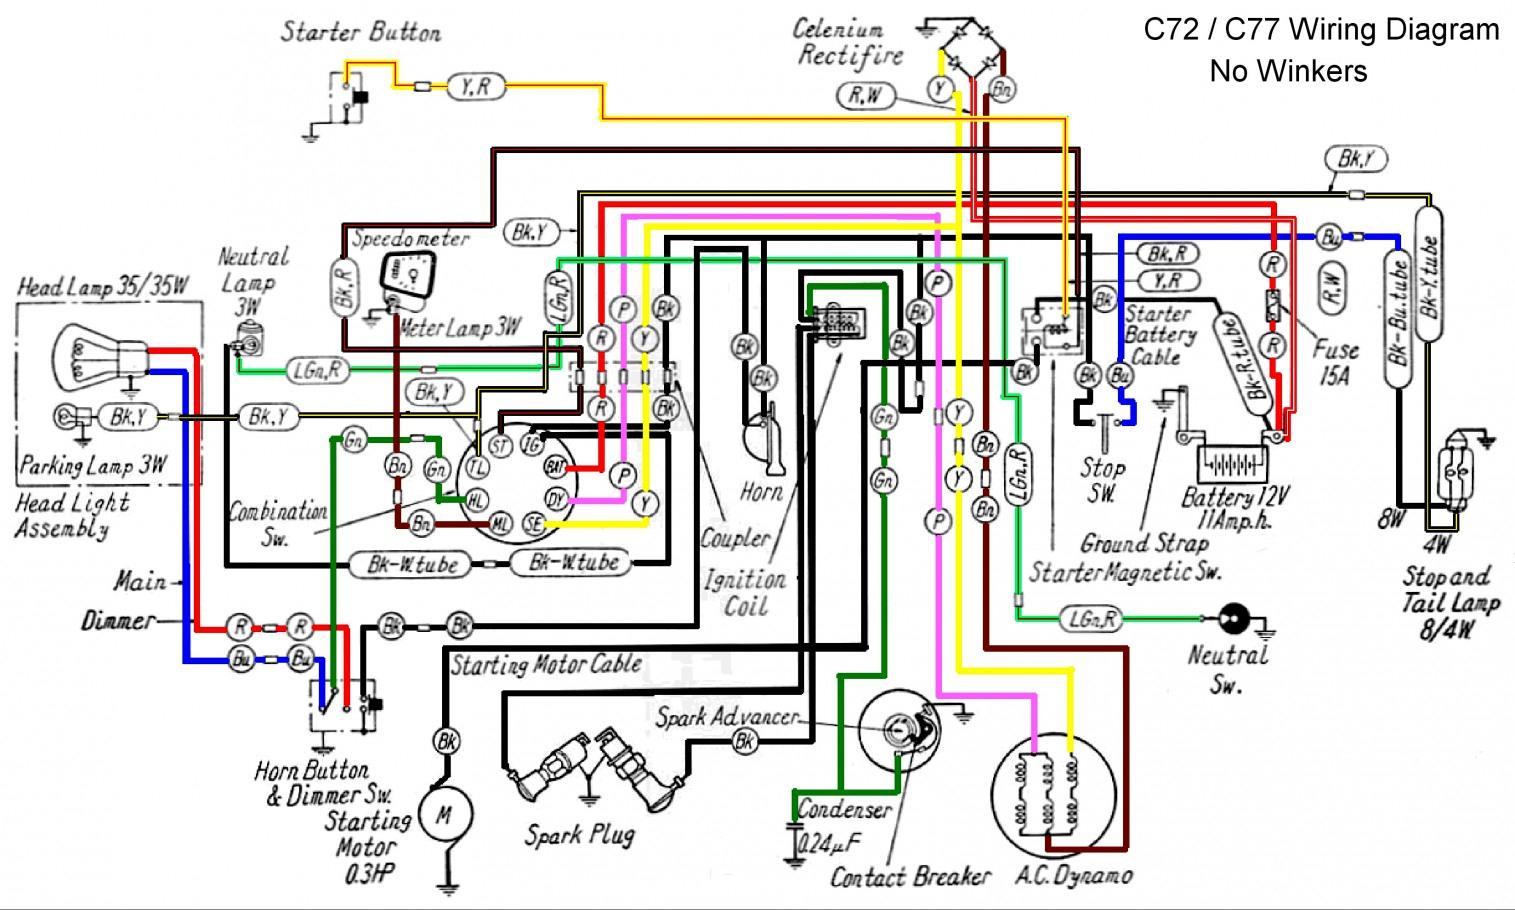 hight resolution of 4l80e transmission external wiring diagram wiring diagram 4l80e transmission wiring diagram